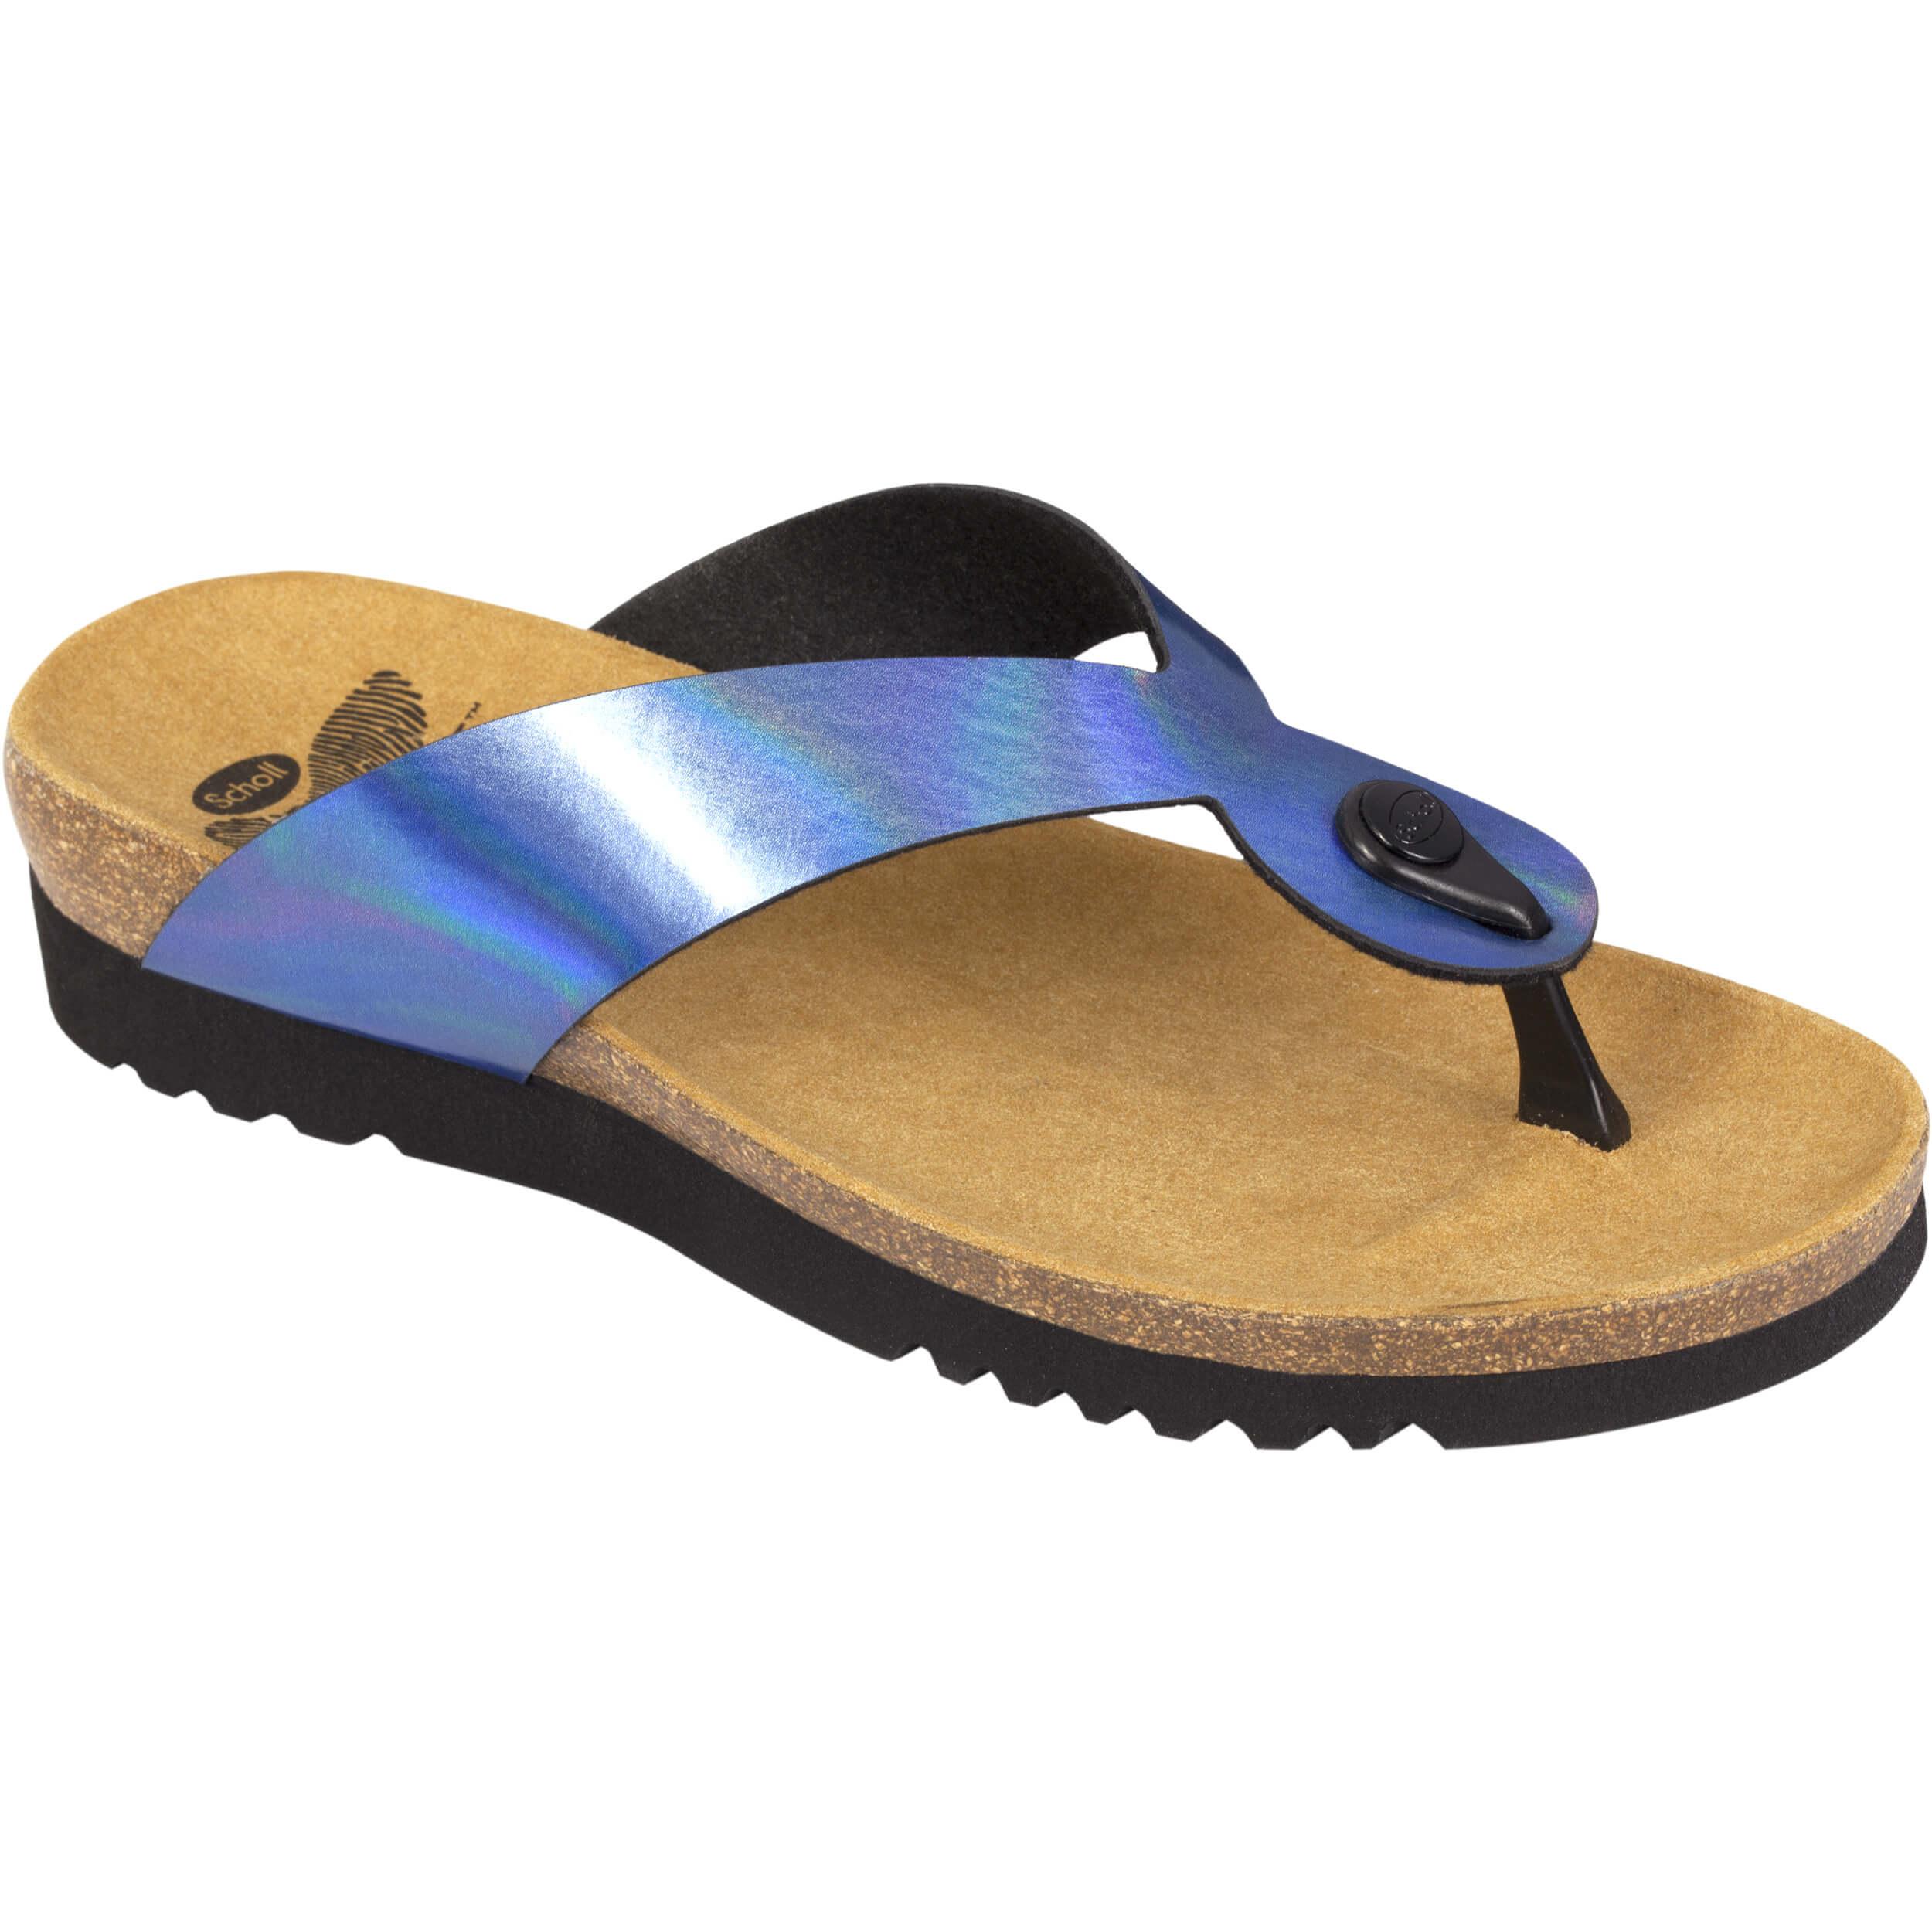 88910add8b3 Dr Scholl Shoes Kenna Μπλε ΝΕΟ Γυναικεία Ανατομικά Παπούτσια Χαρίζουν Σωστή  Στάση & Φυσικό Χωρίς Πόνο